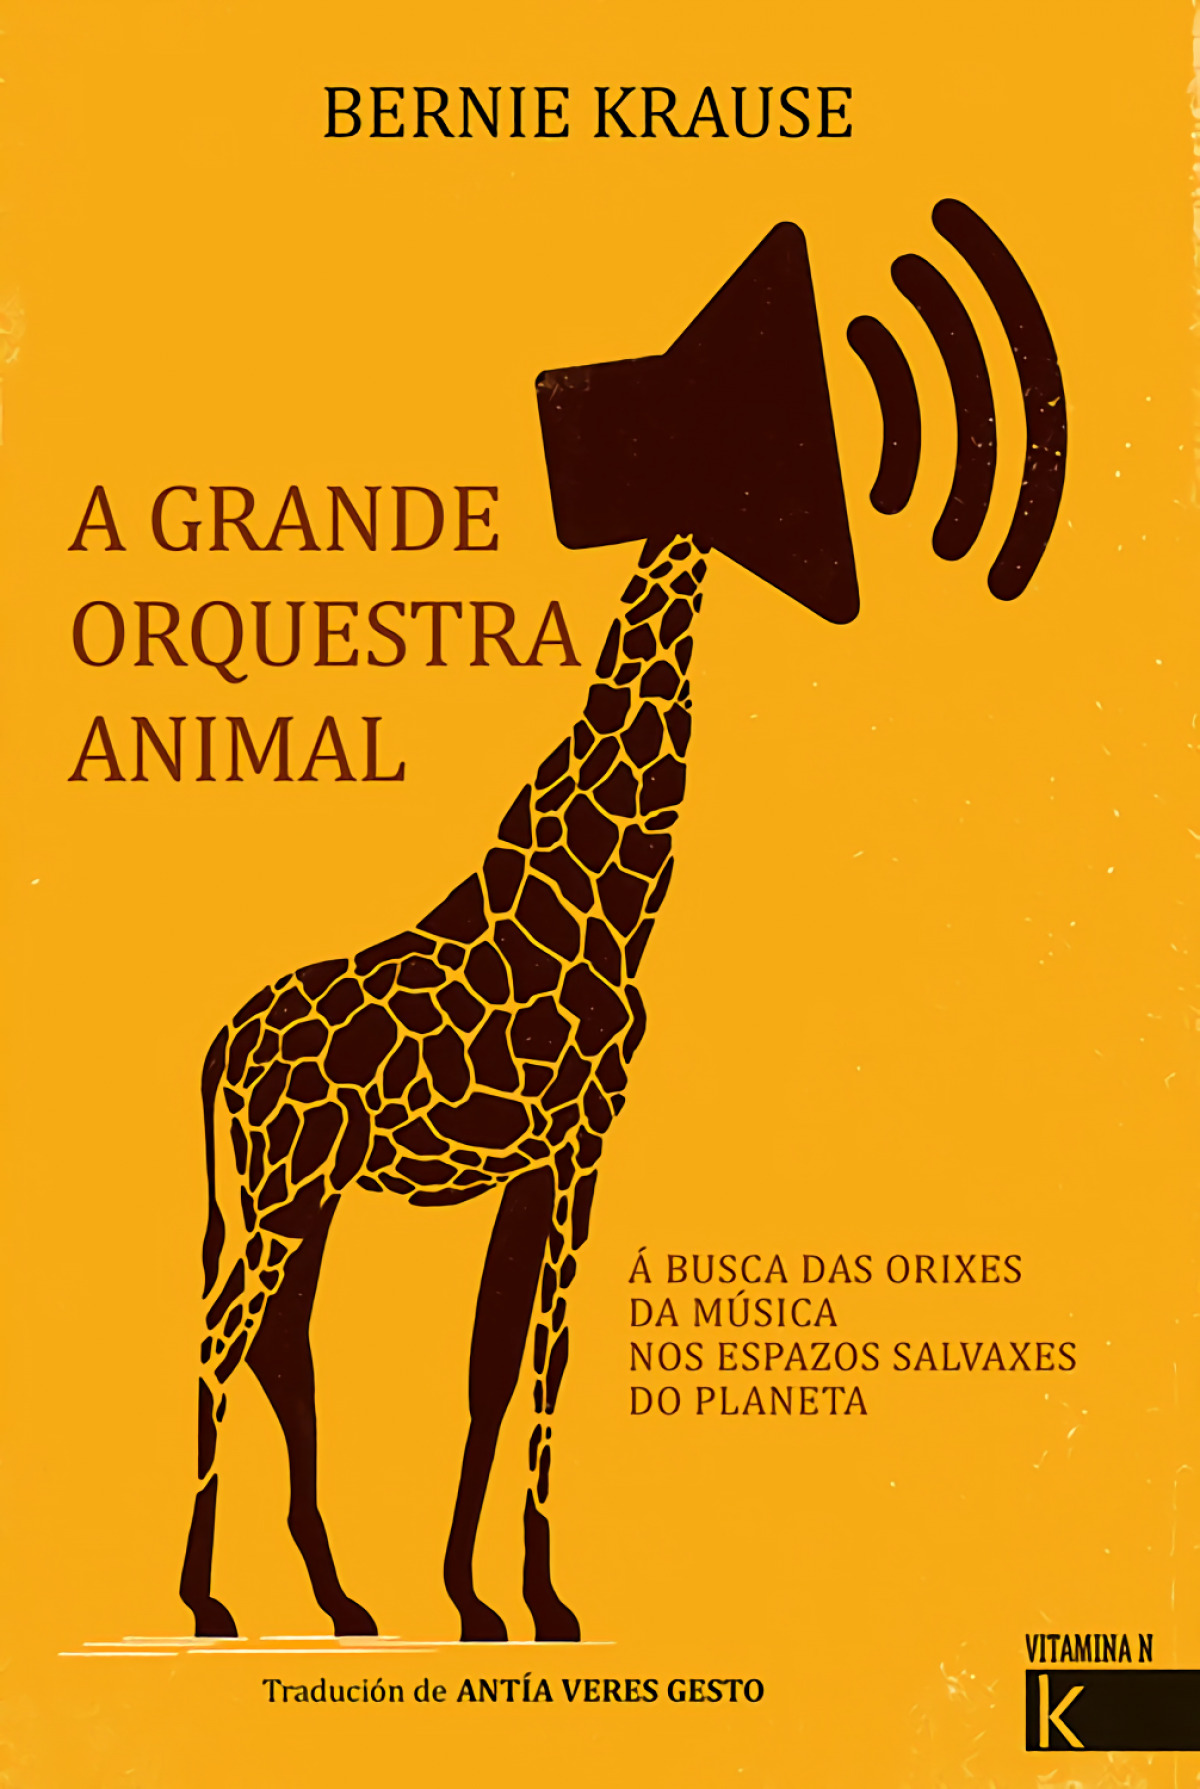 A grande orquestra animal